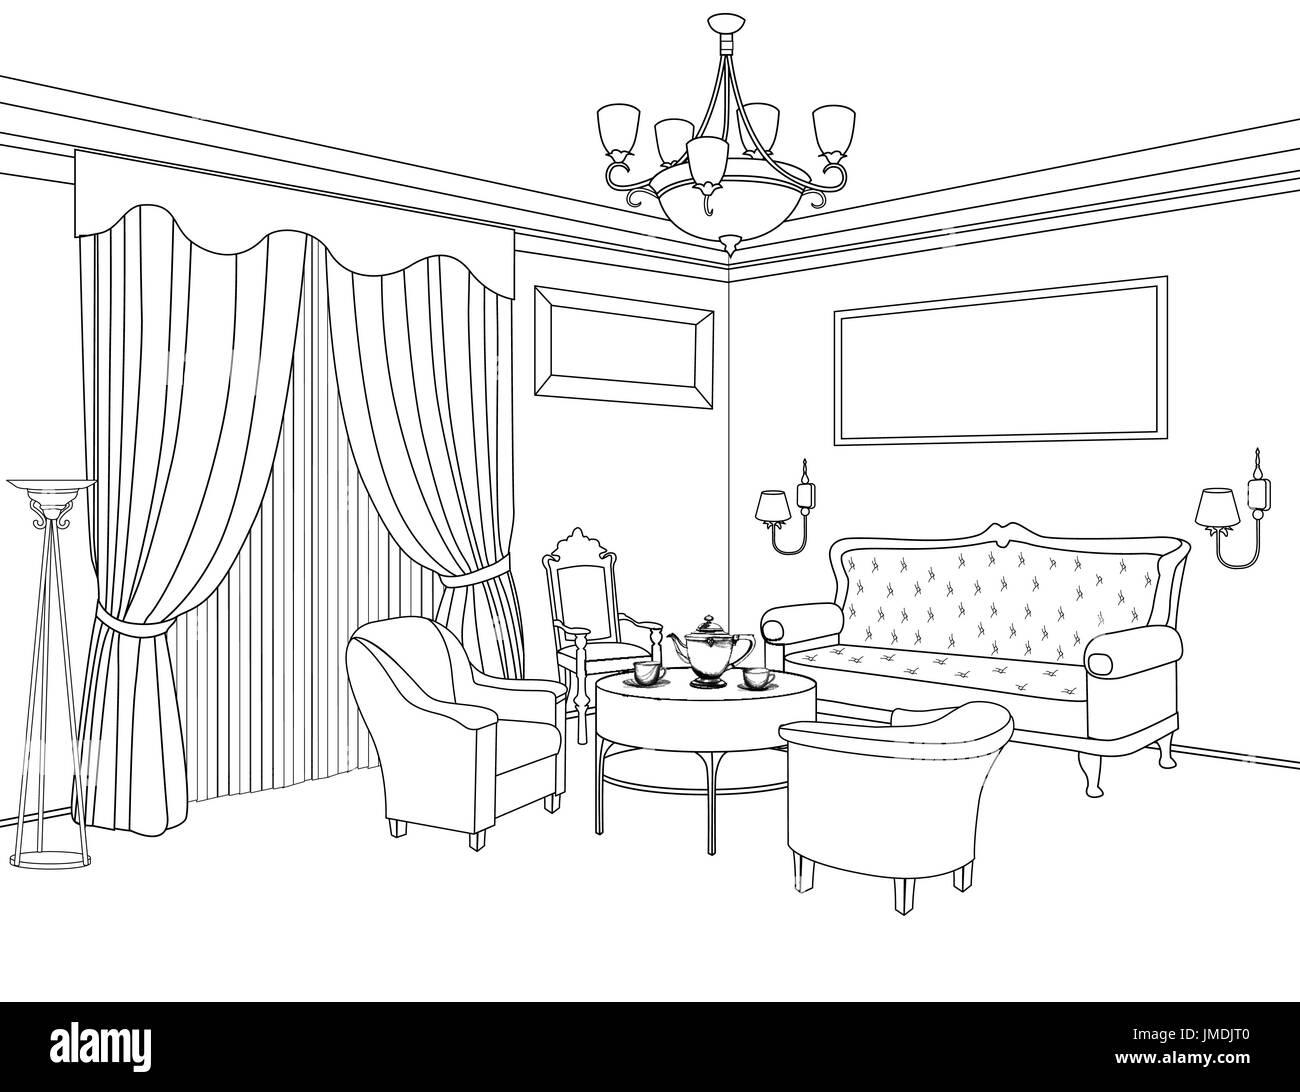 Vintage architectural drawing stock photos vintage for Living room interior design sketch